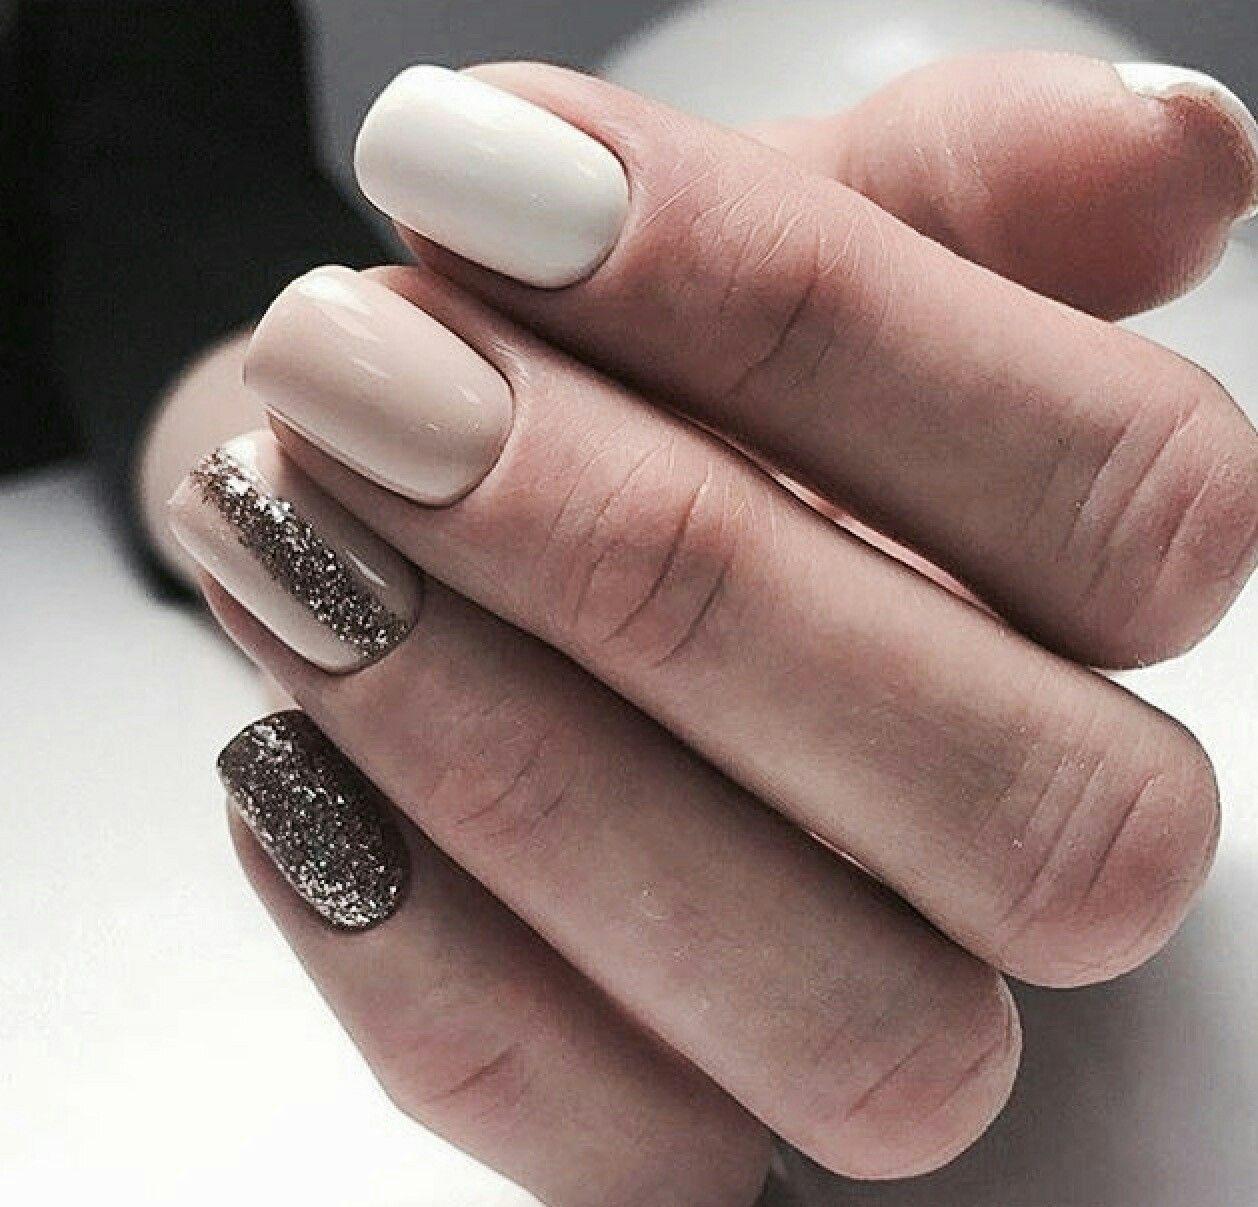 Дизайн ногтей фото. Дизайн ногтей 37